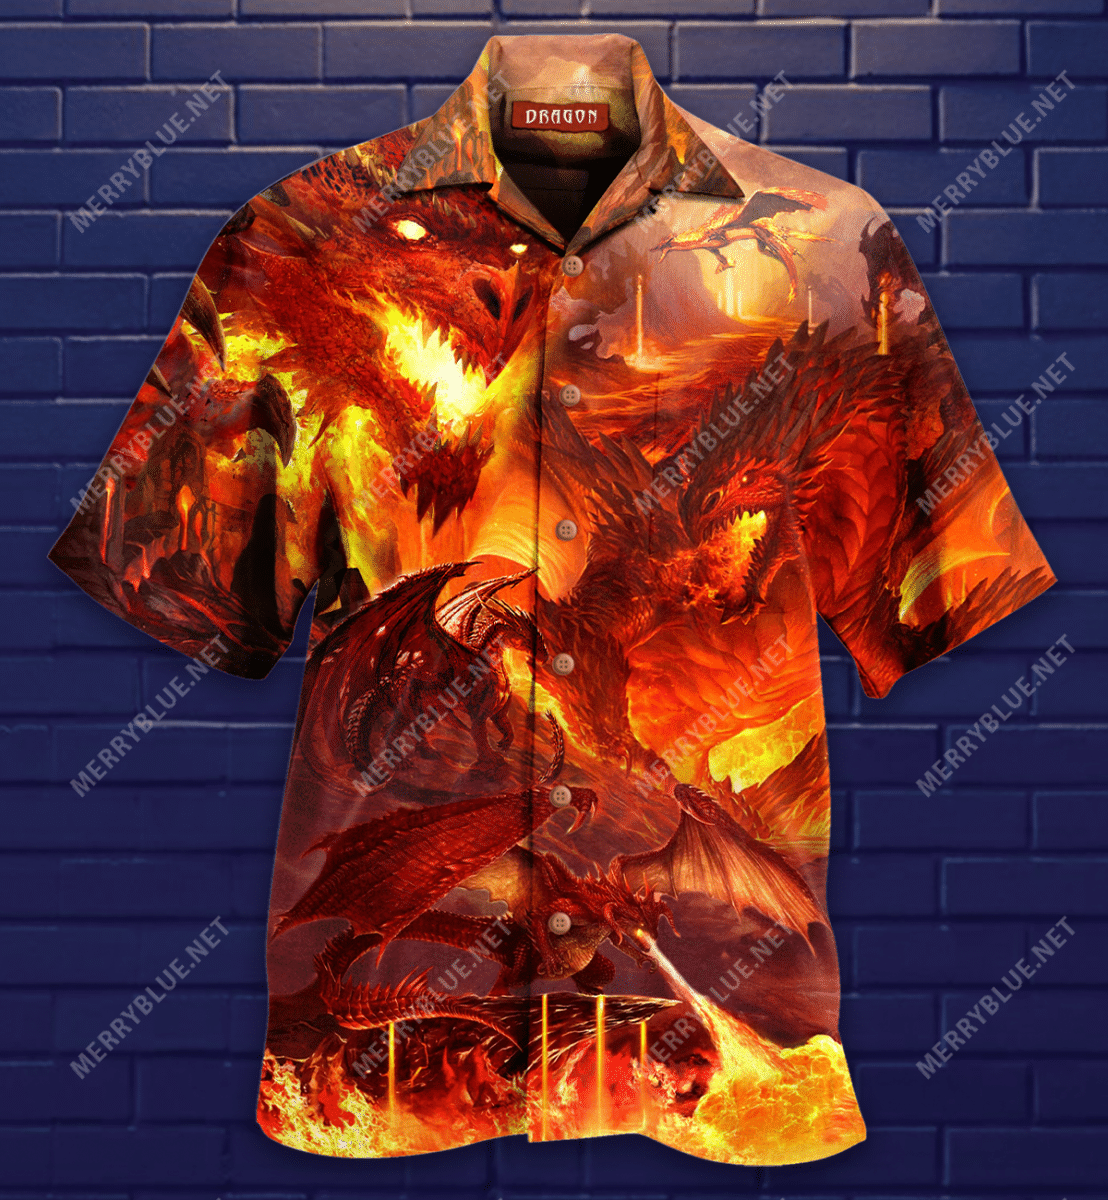 Burn World Of The Dragon Hawaiian Shirt